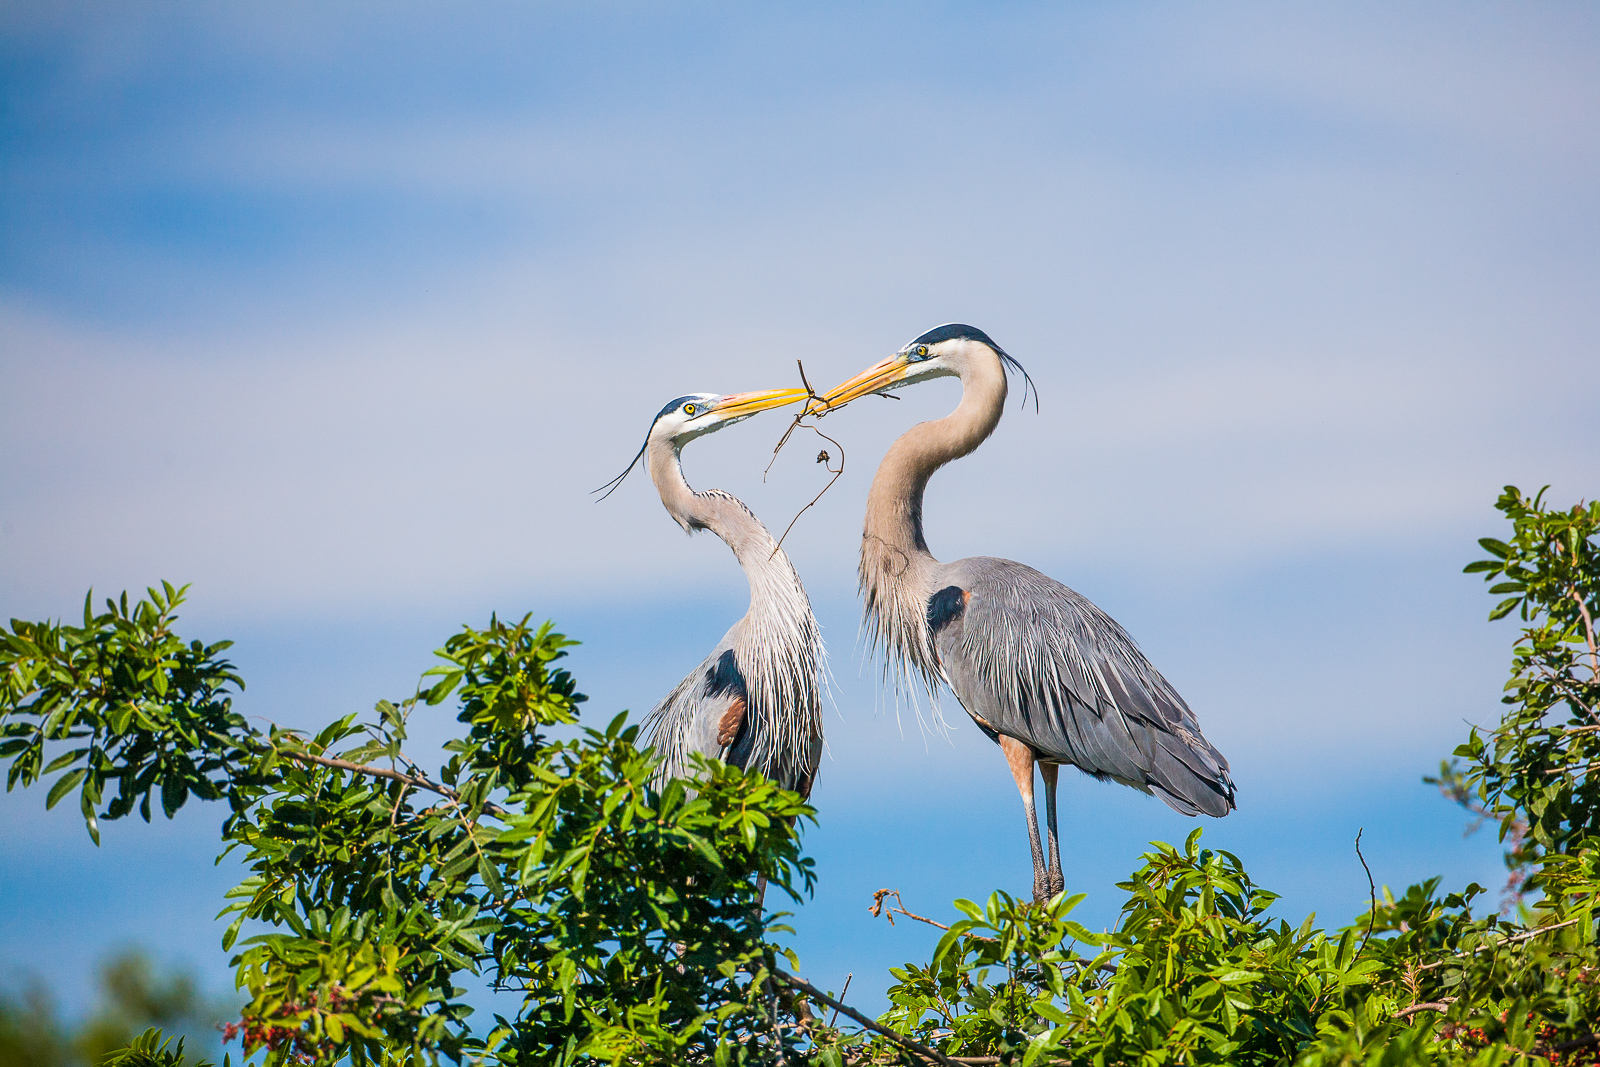 Heart To Heart,Venice Rookery, Florida, Bird,Nest, Great Blue Heron, photo